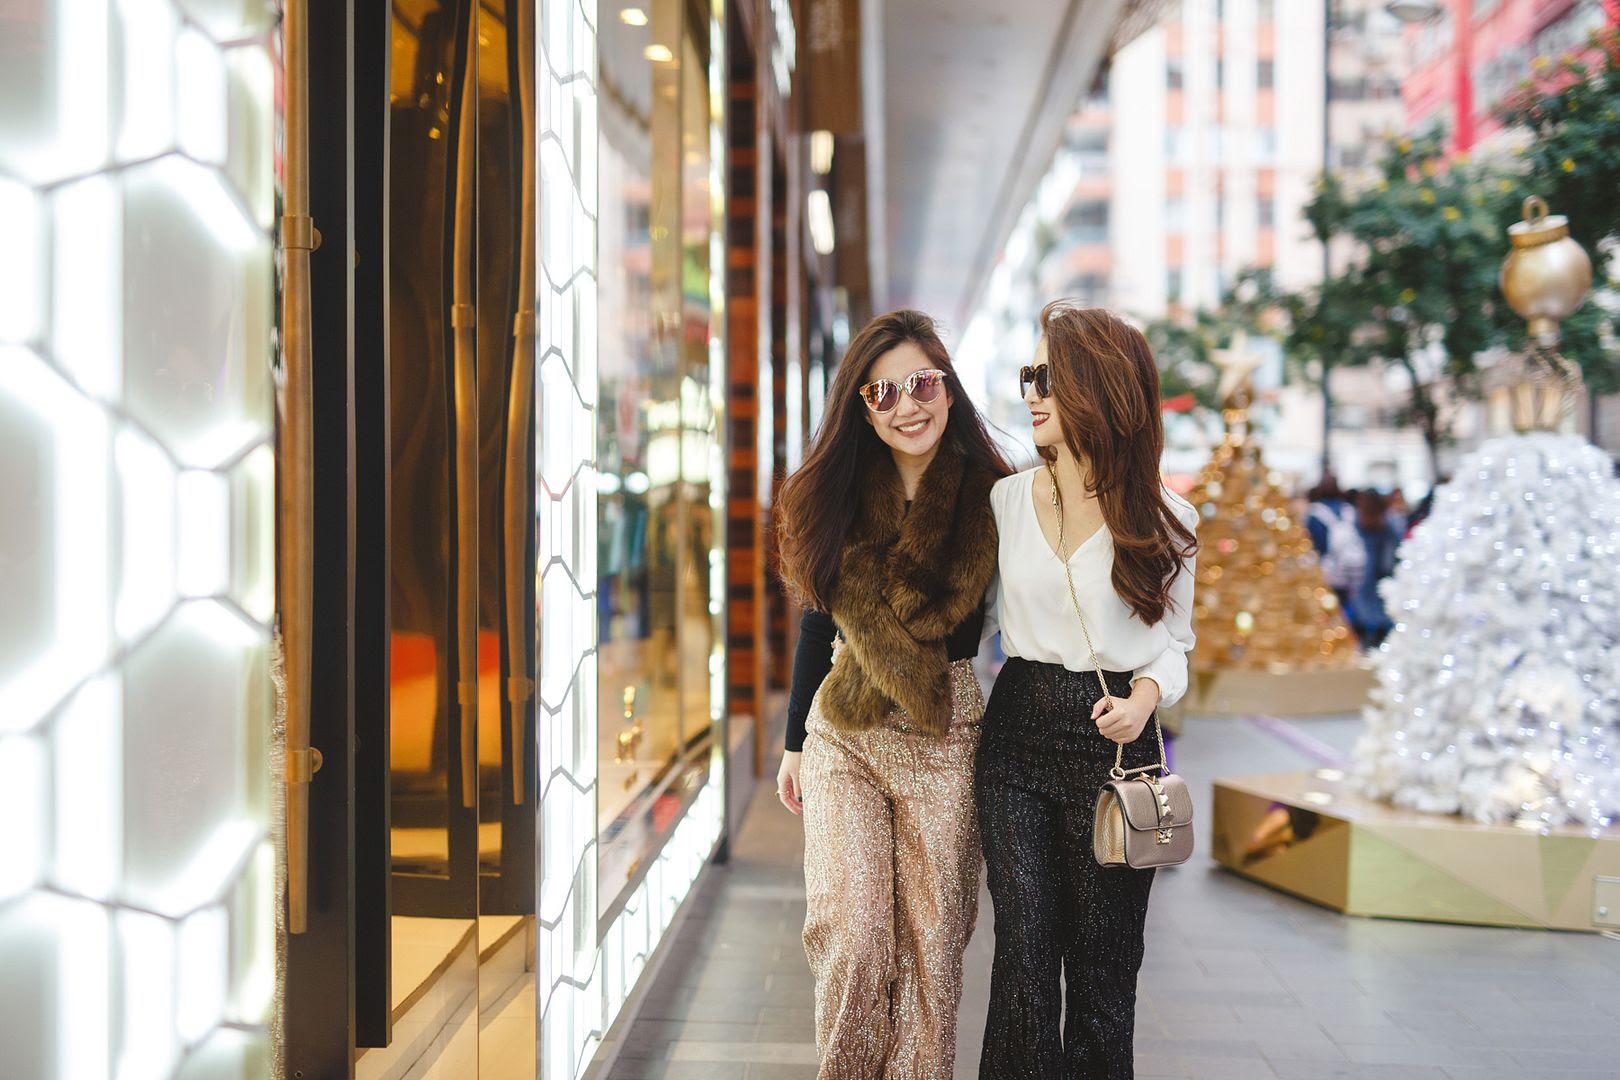 photo silvia_siantar-hongkong-111_1482921665resize_zpszxr5dbfh.jpg